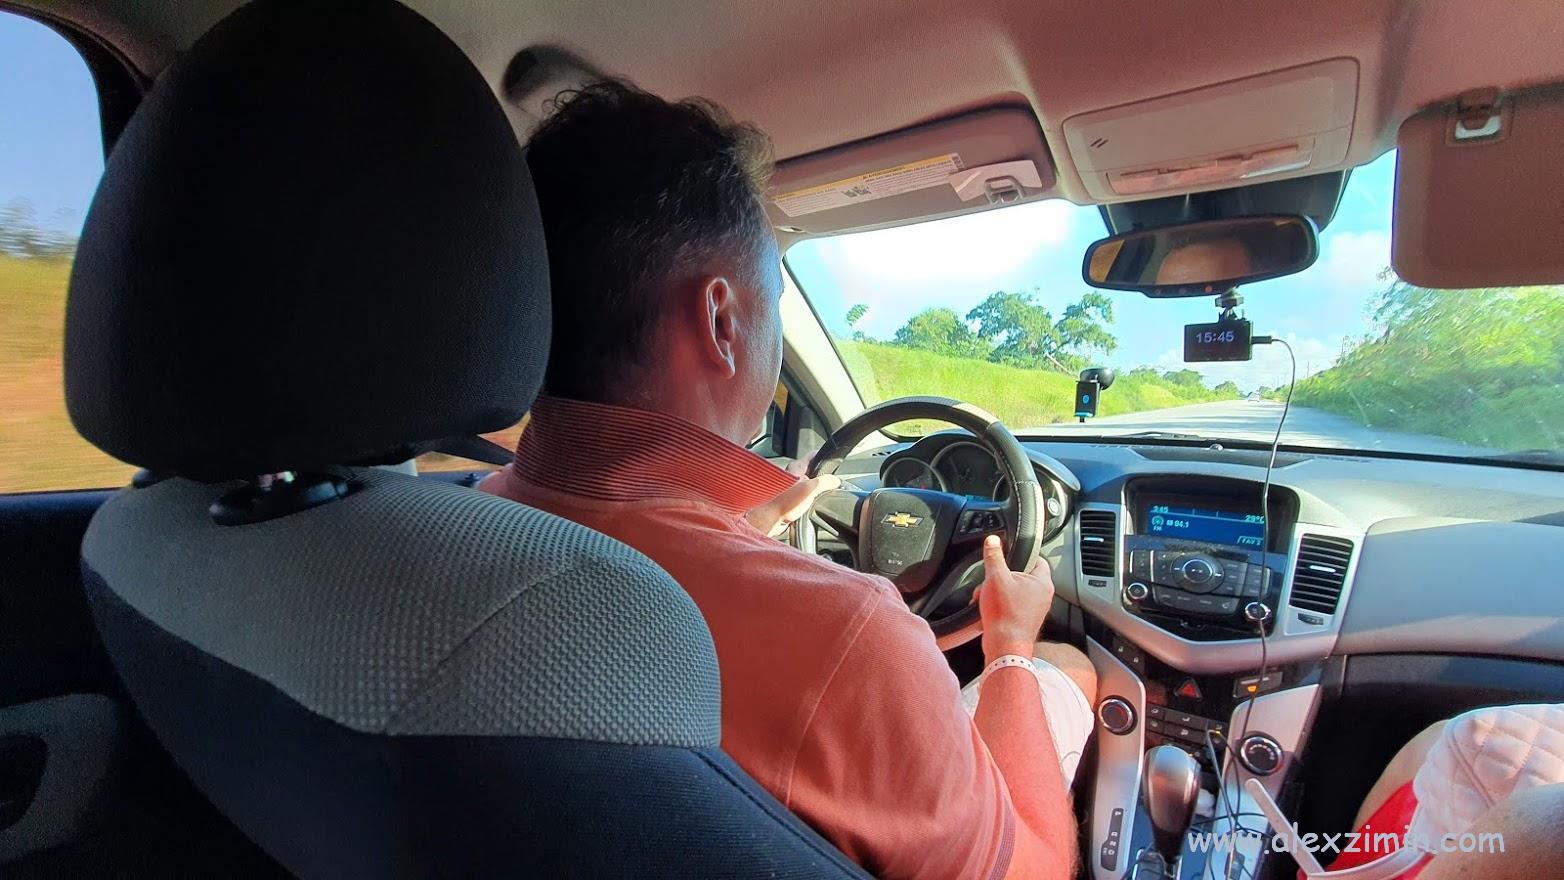 Аренда авто в Доминикане от А до Я. Подробное руководство